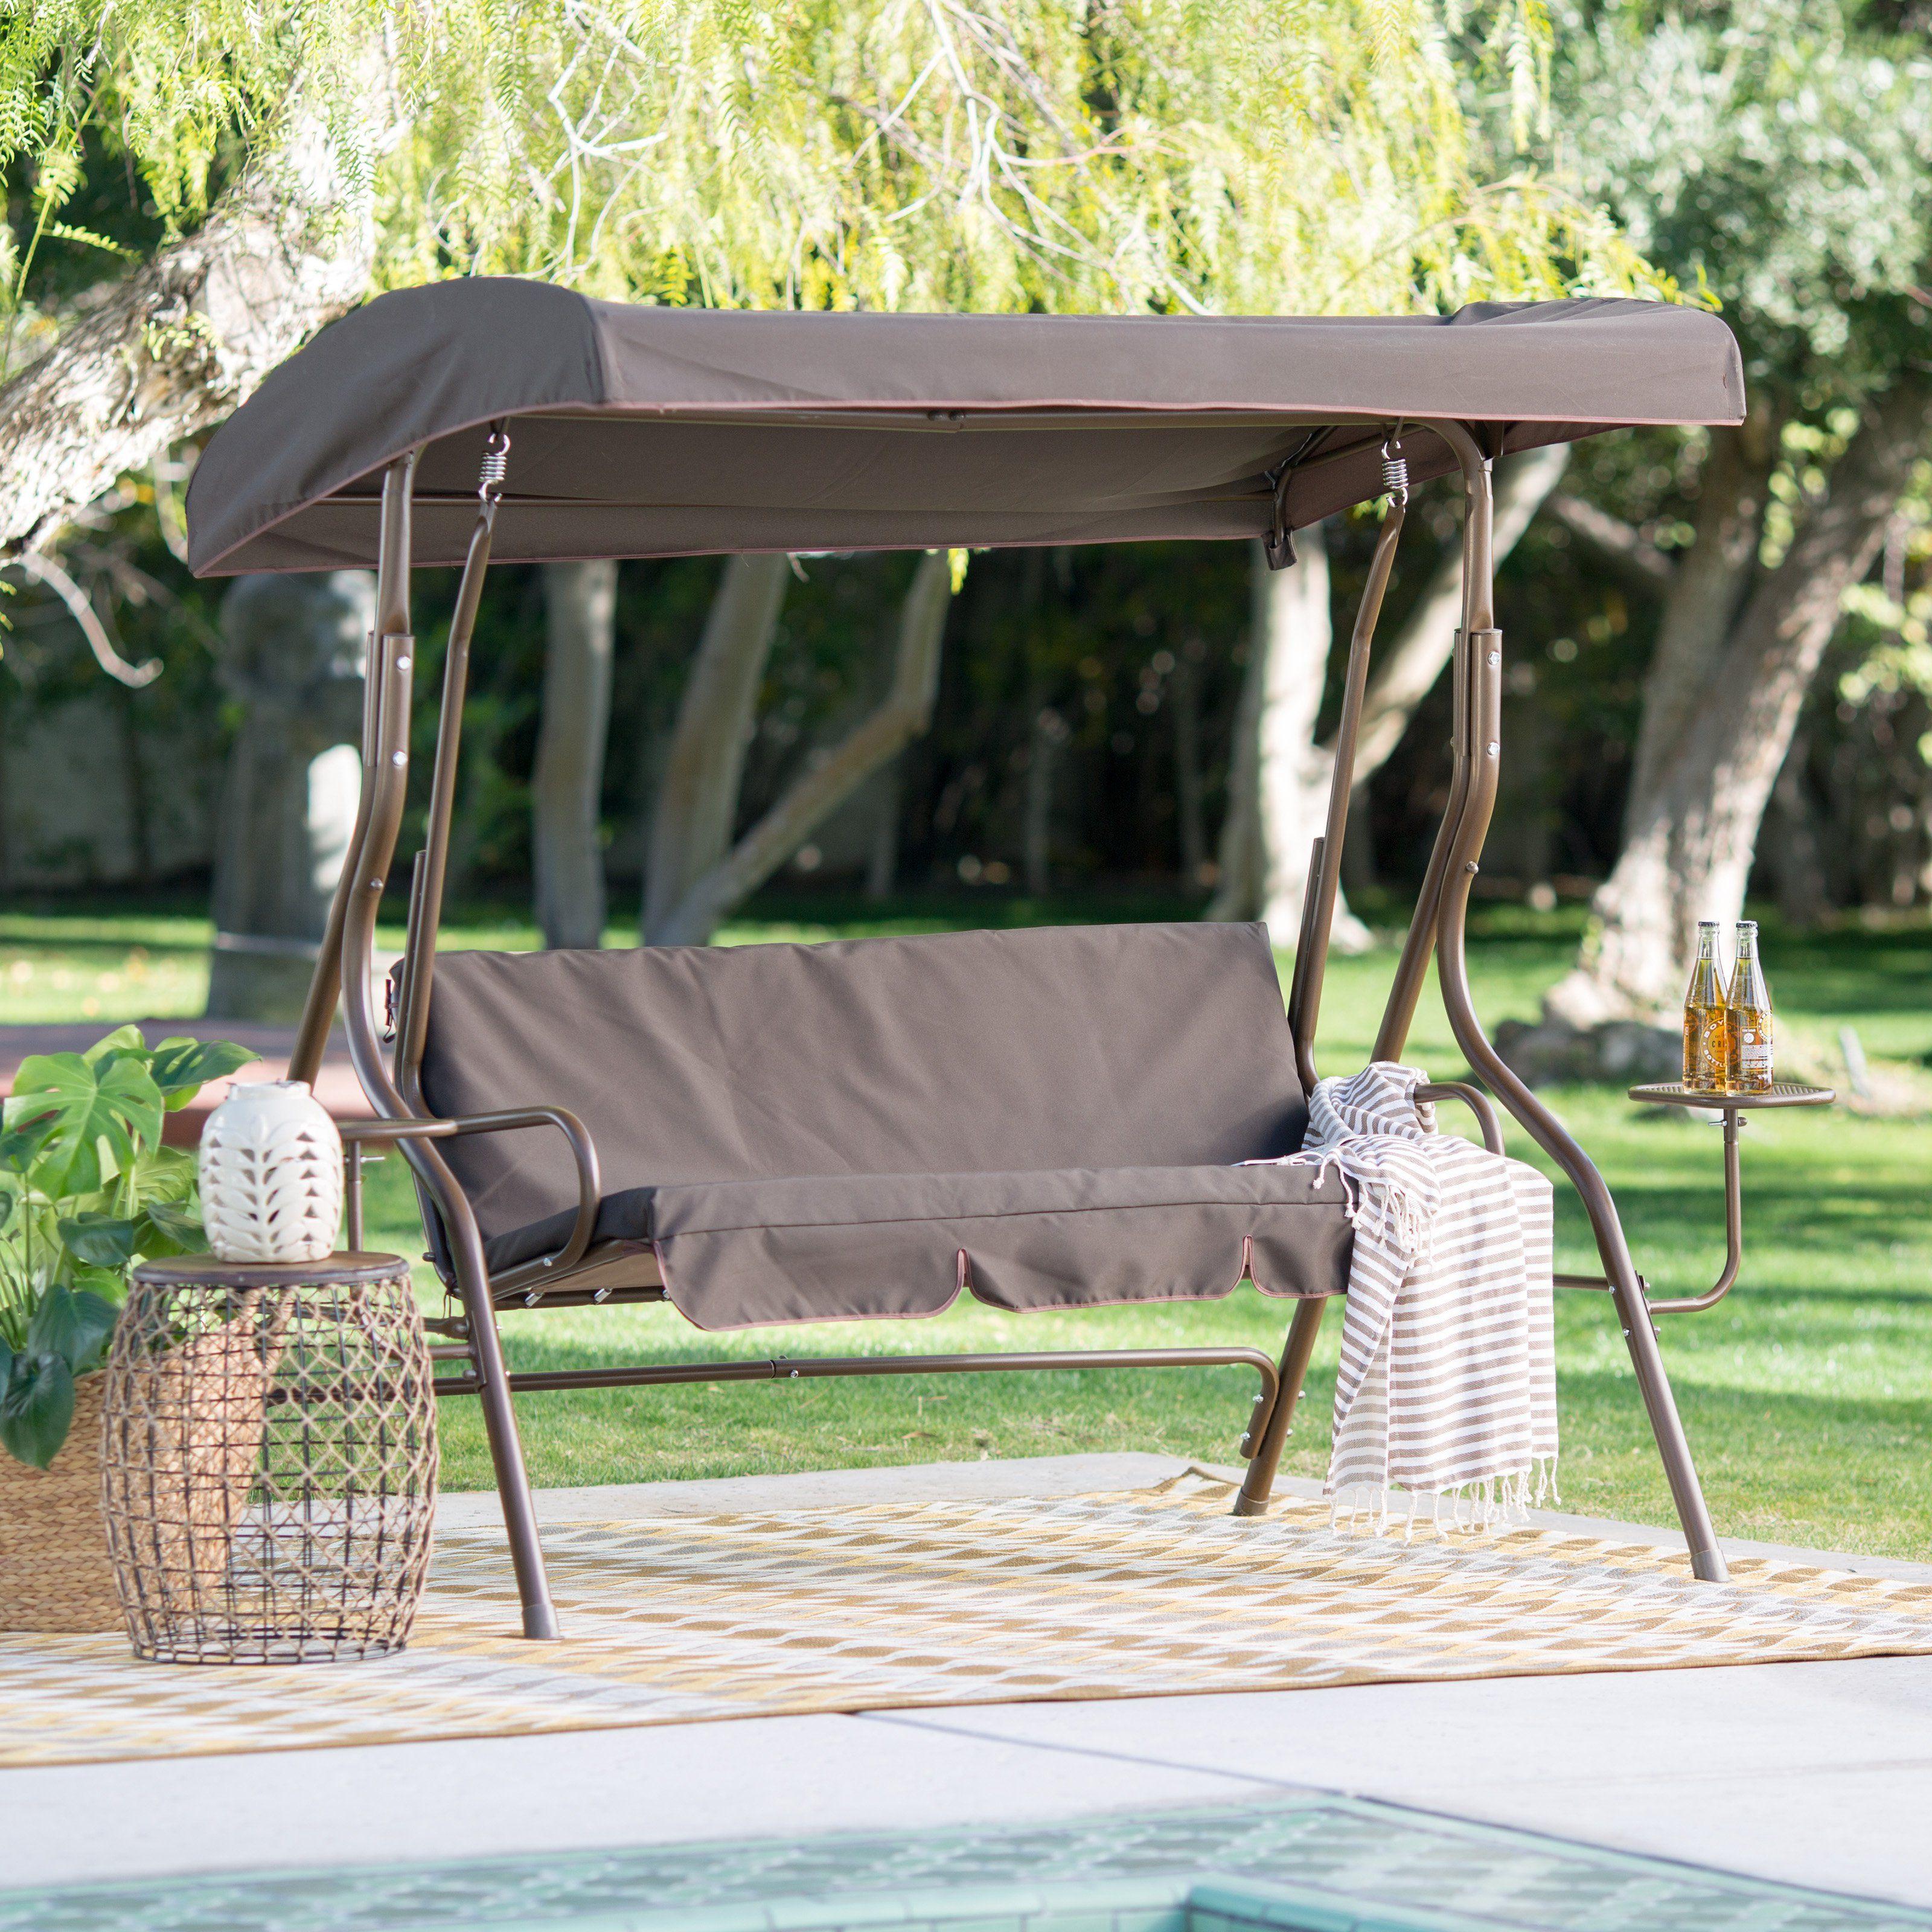 Coral Coast Lakewood 2 Person Adjustable Tilt Canopy Metal Swing